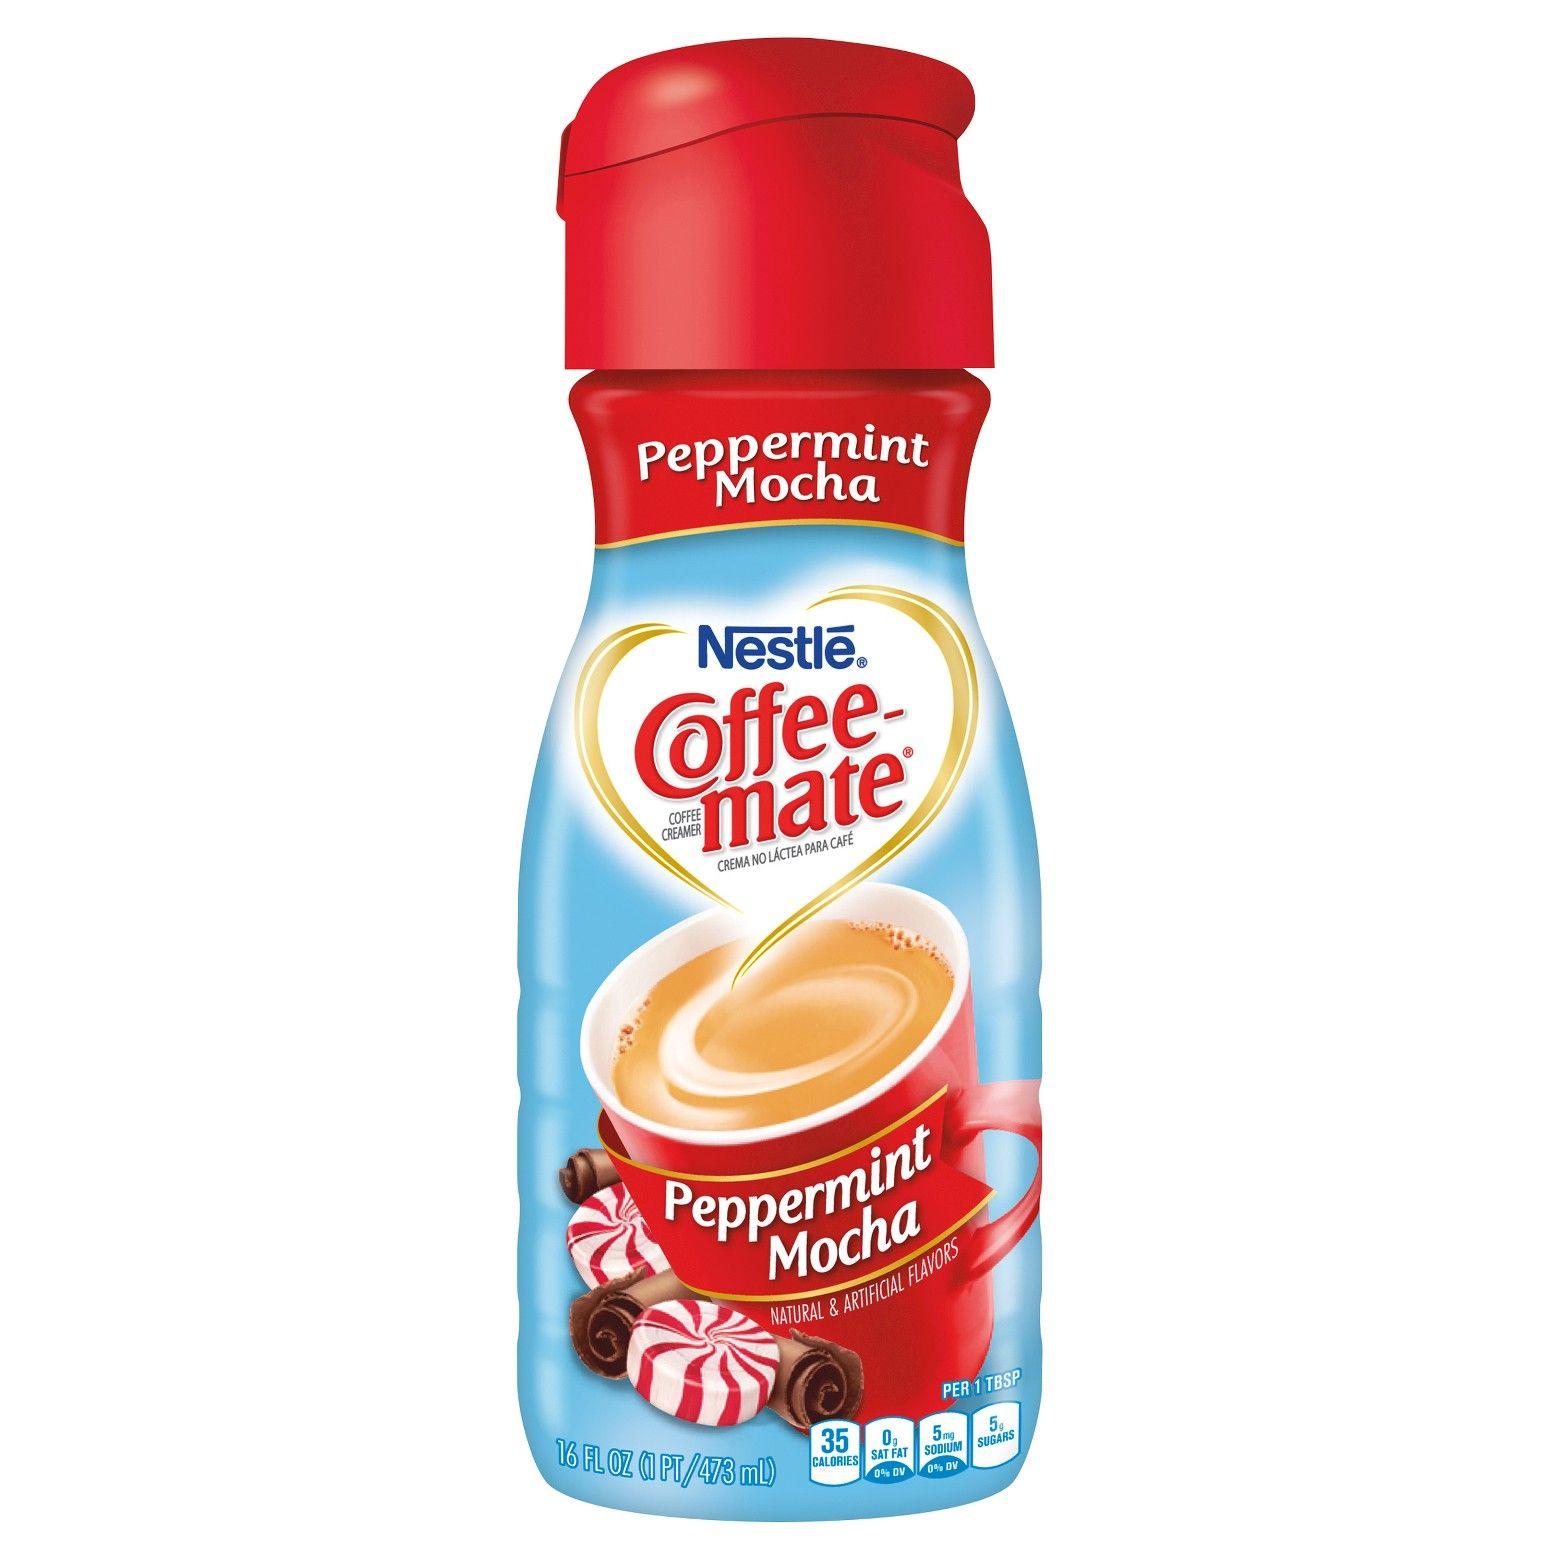 Coffee mate peppermint mocha coffee creamer 1pt nestle